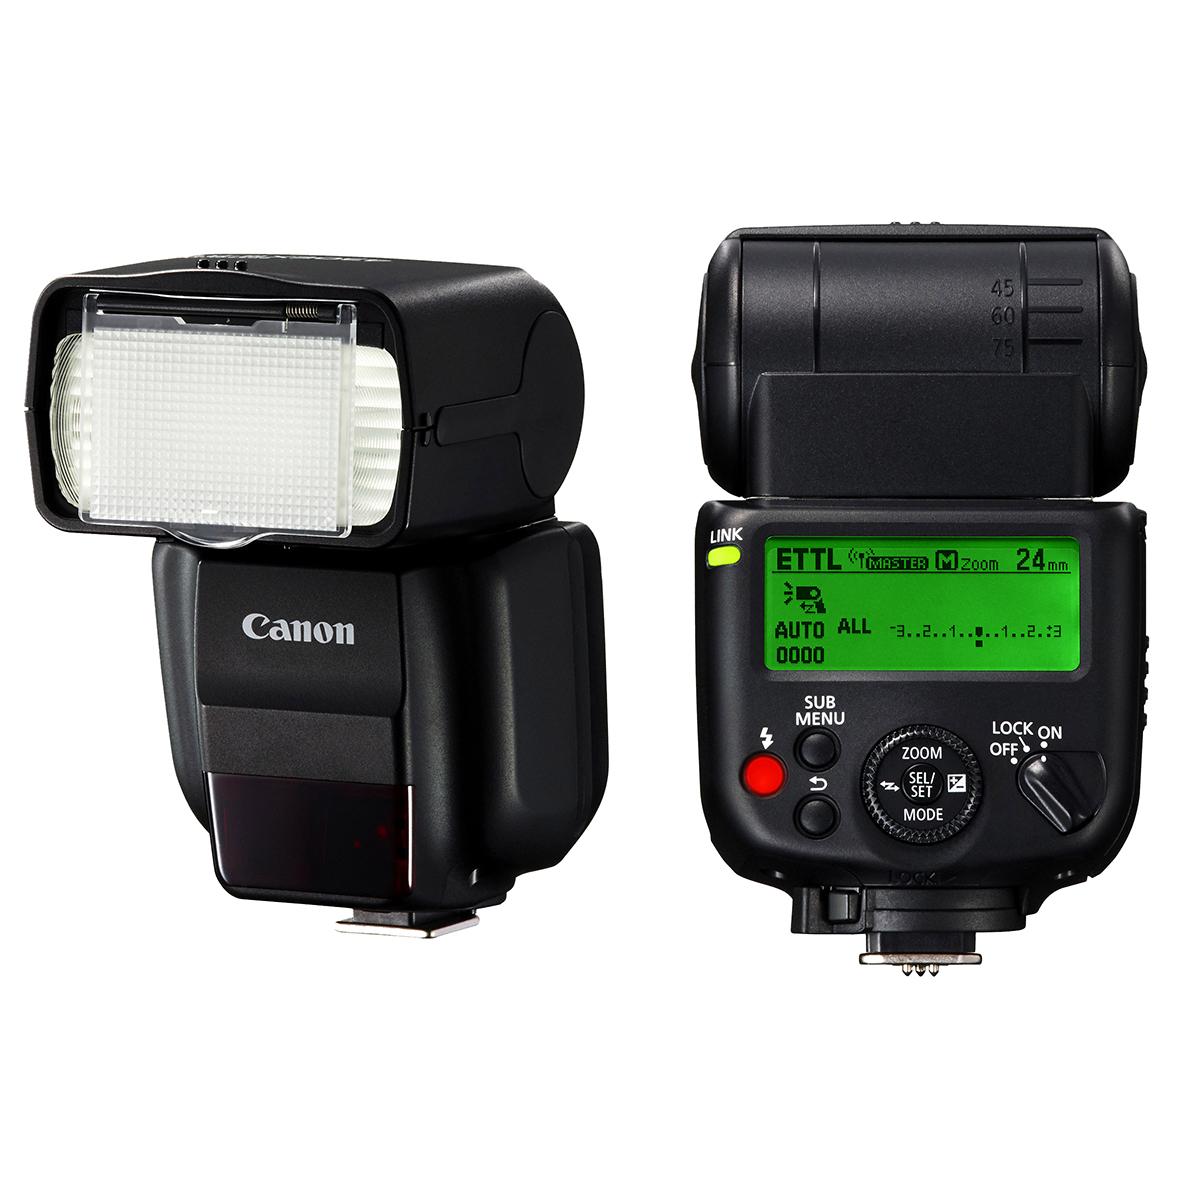 Immagine Canon Flash Speedlite 430EX III RT